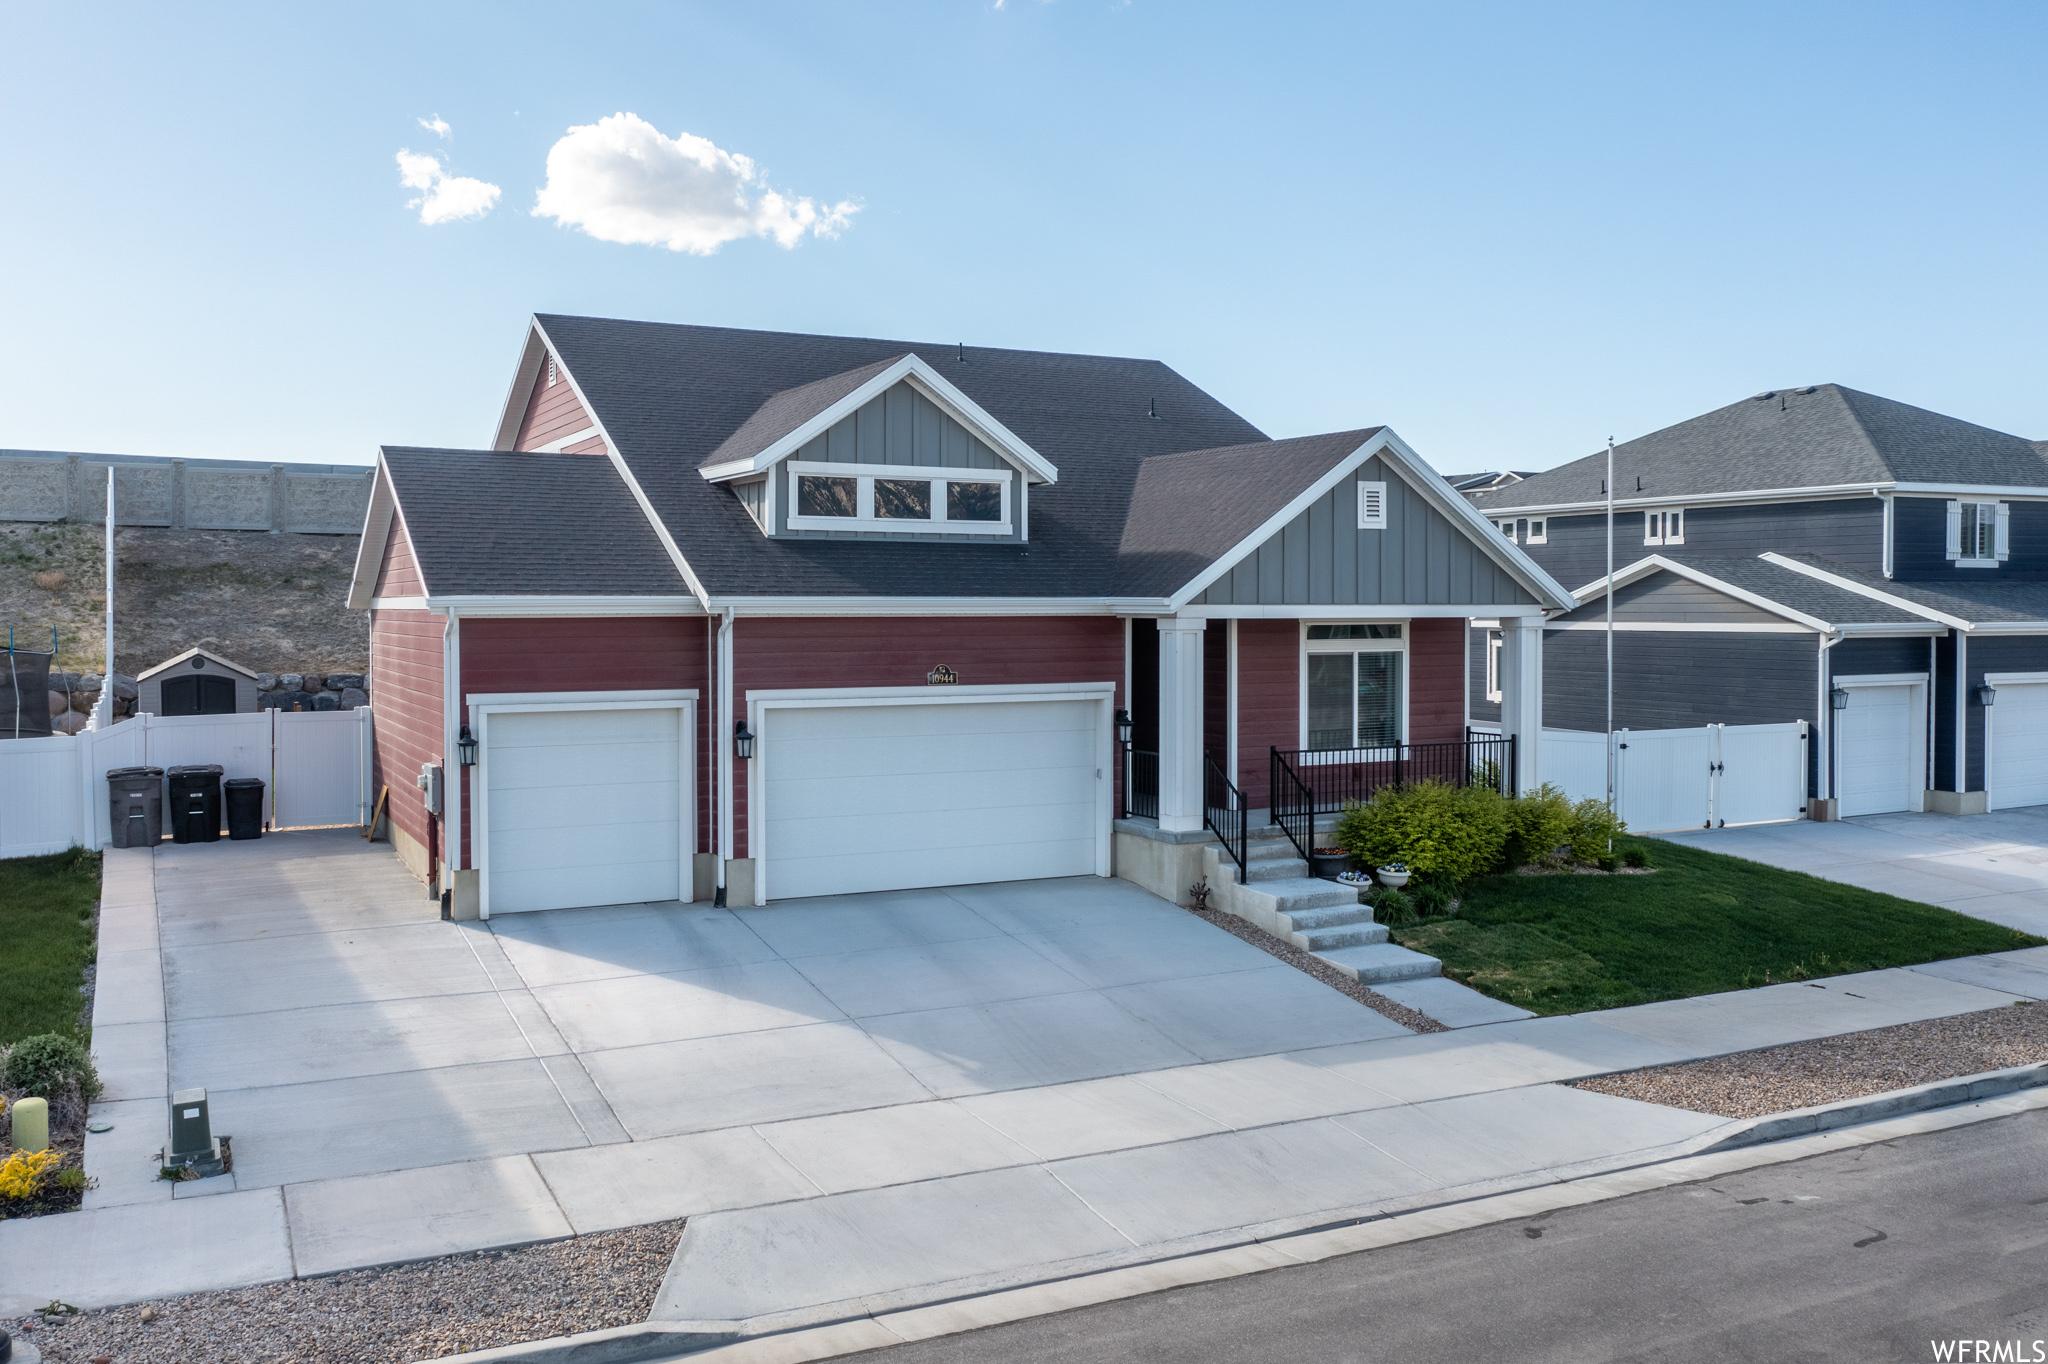 10944 S RAPHI PL, South Jordan, Utah 84095, 4 Bedrooms Bedrooms, ,4 BathroomsBathrooms,Single Family,For Sale,10944 S RAPHI PL,1740470